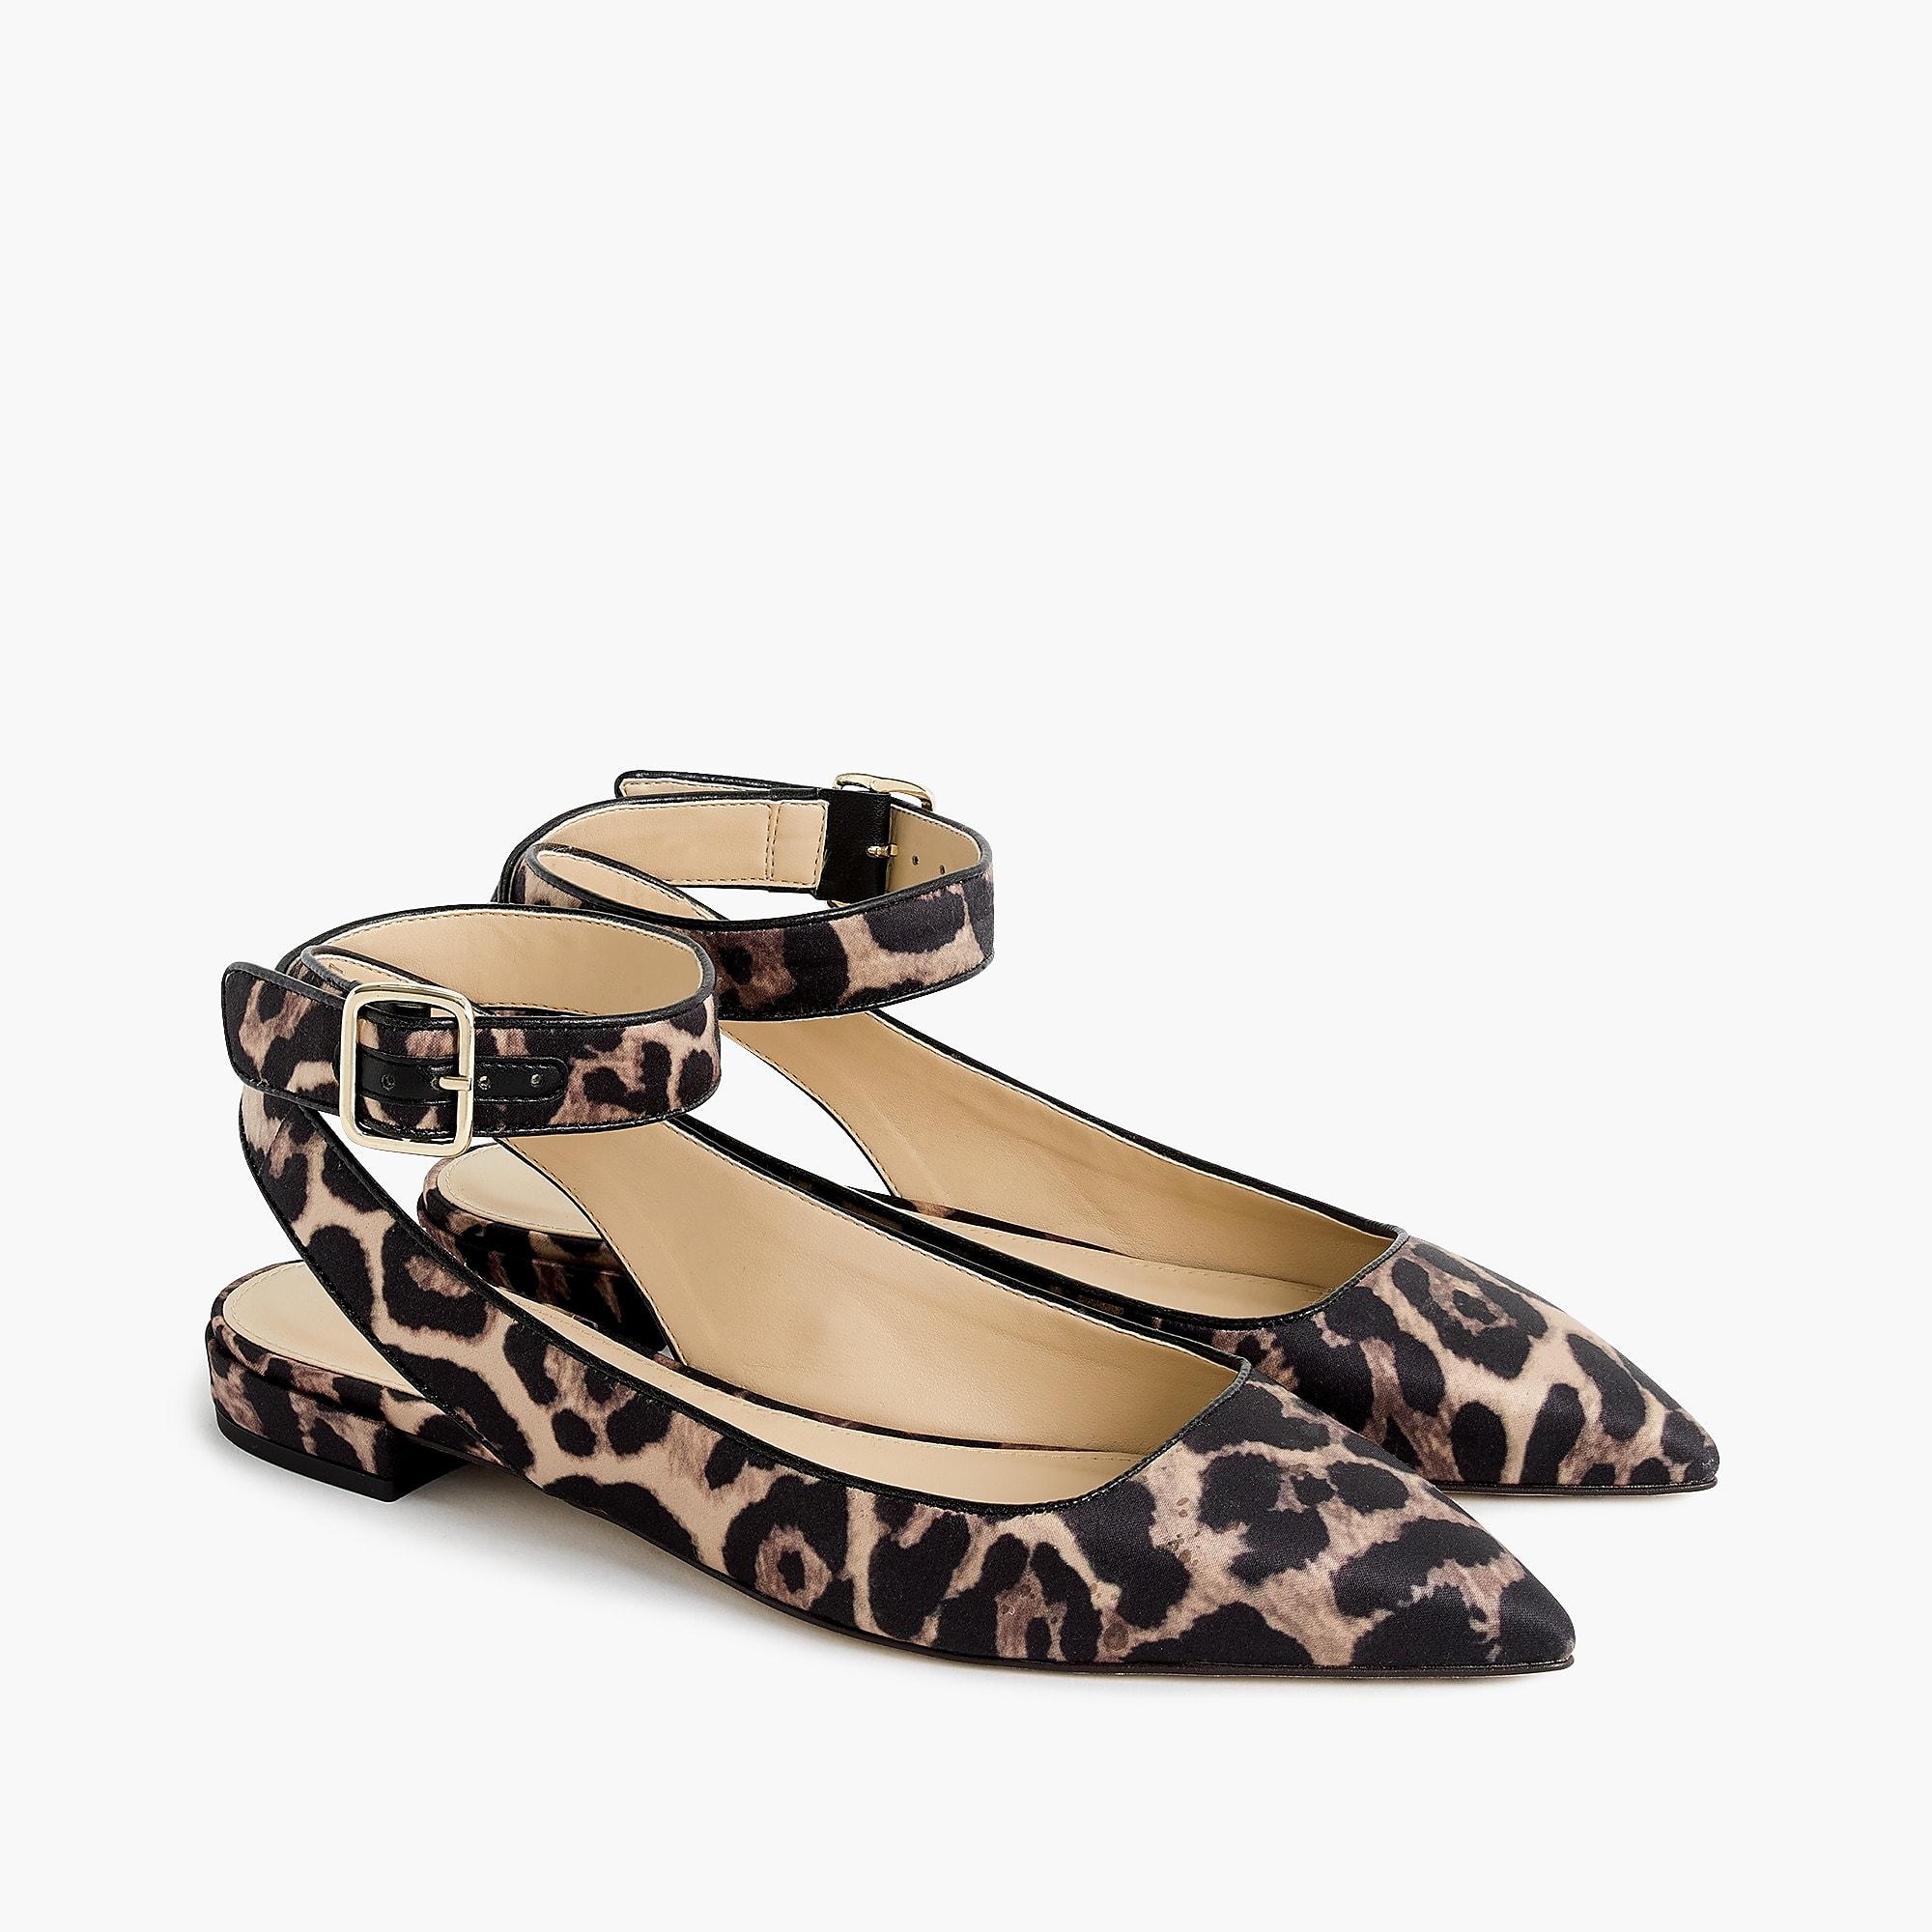 98ac572aac40 J Crew leopard print ankle strap flats – En Brogue